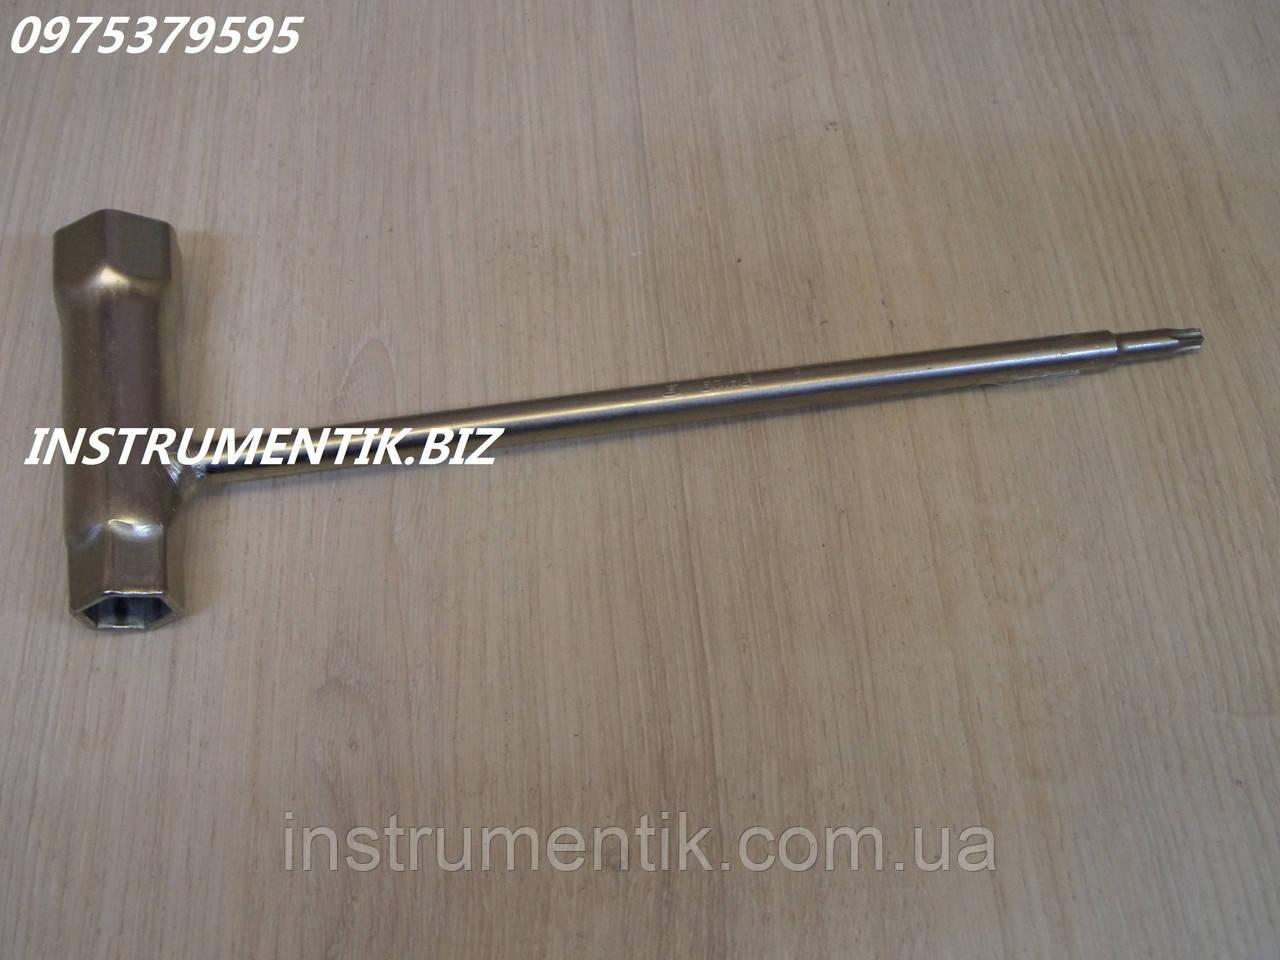 Ключ свечной STIHL 13*19 мм. TORX 27 (звездочка) для мотокос